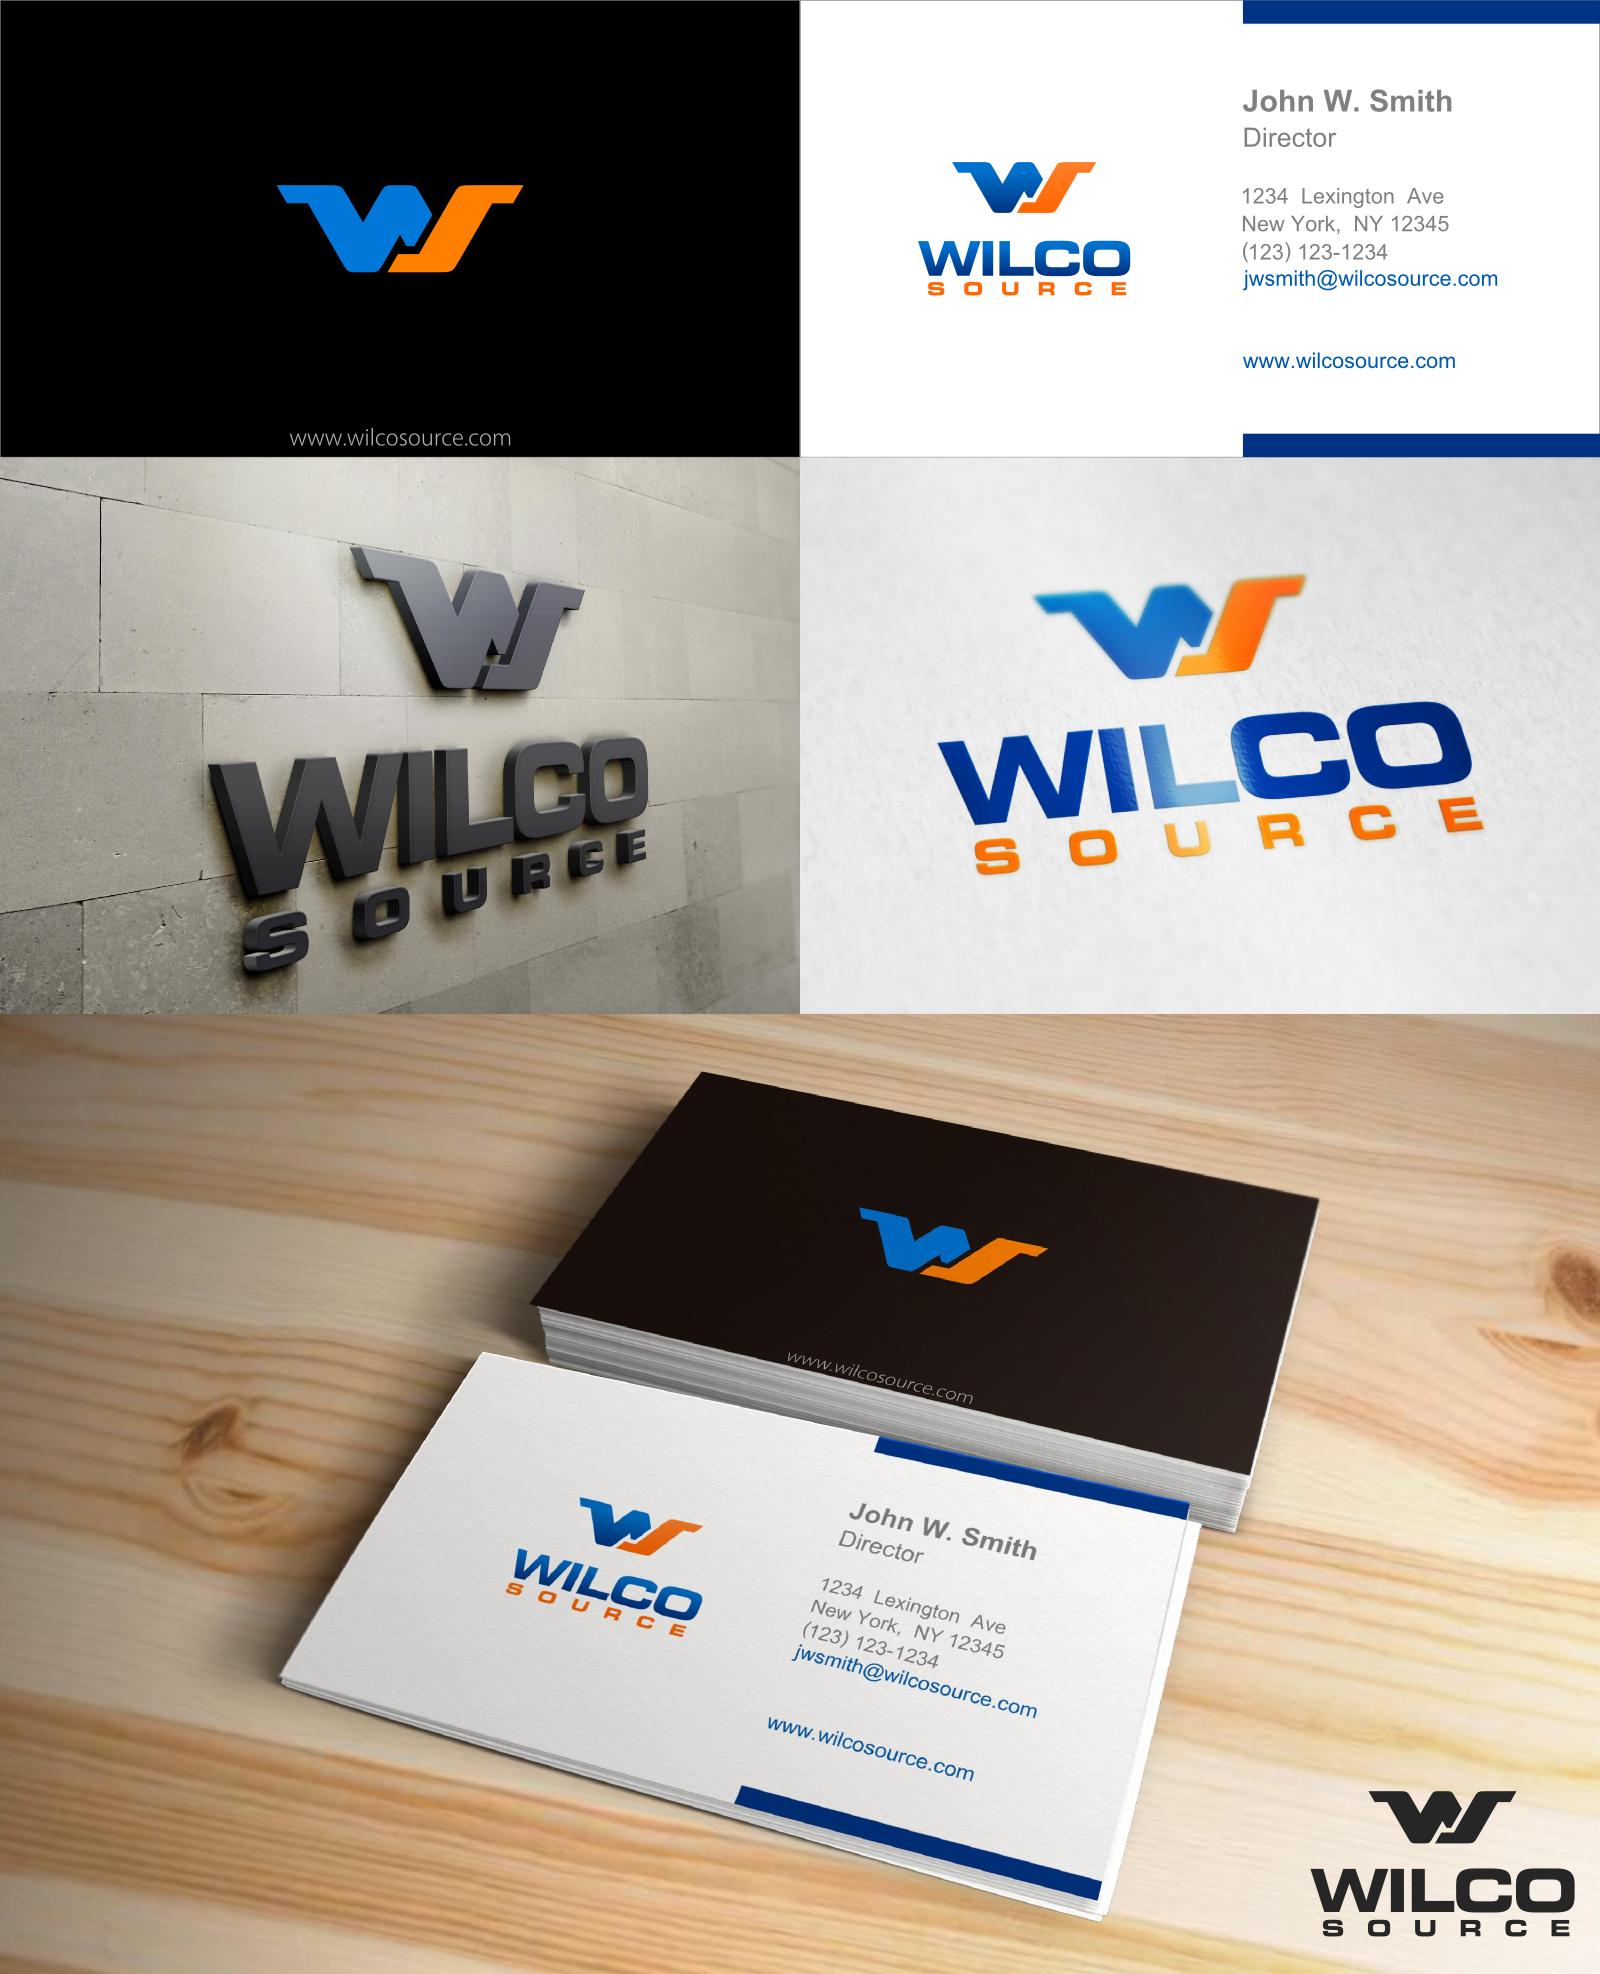 Rocking logo for Wilco Source